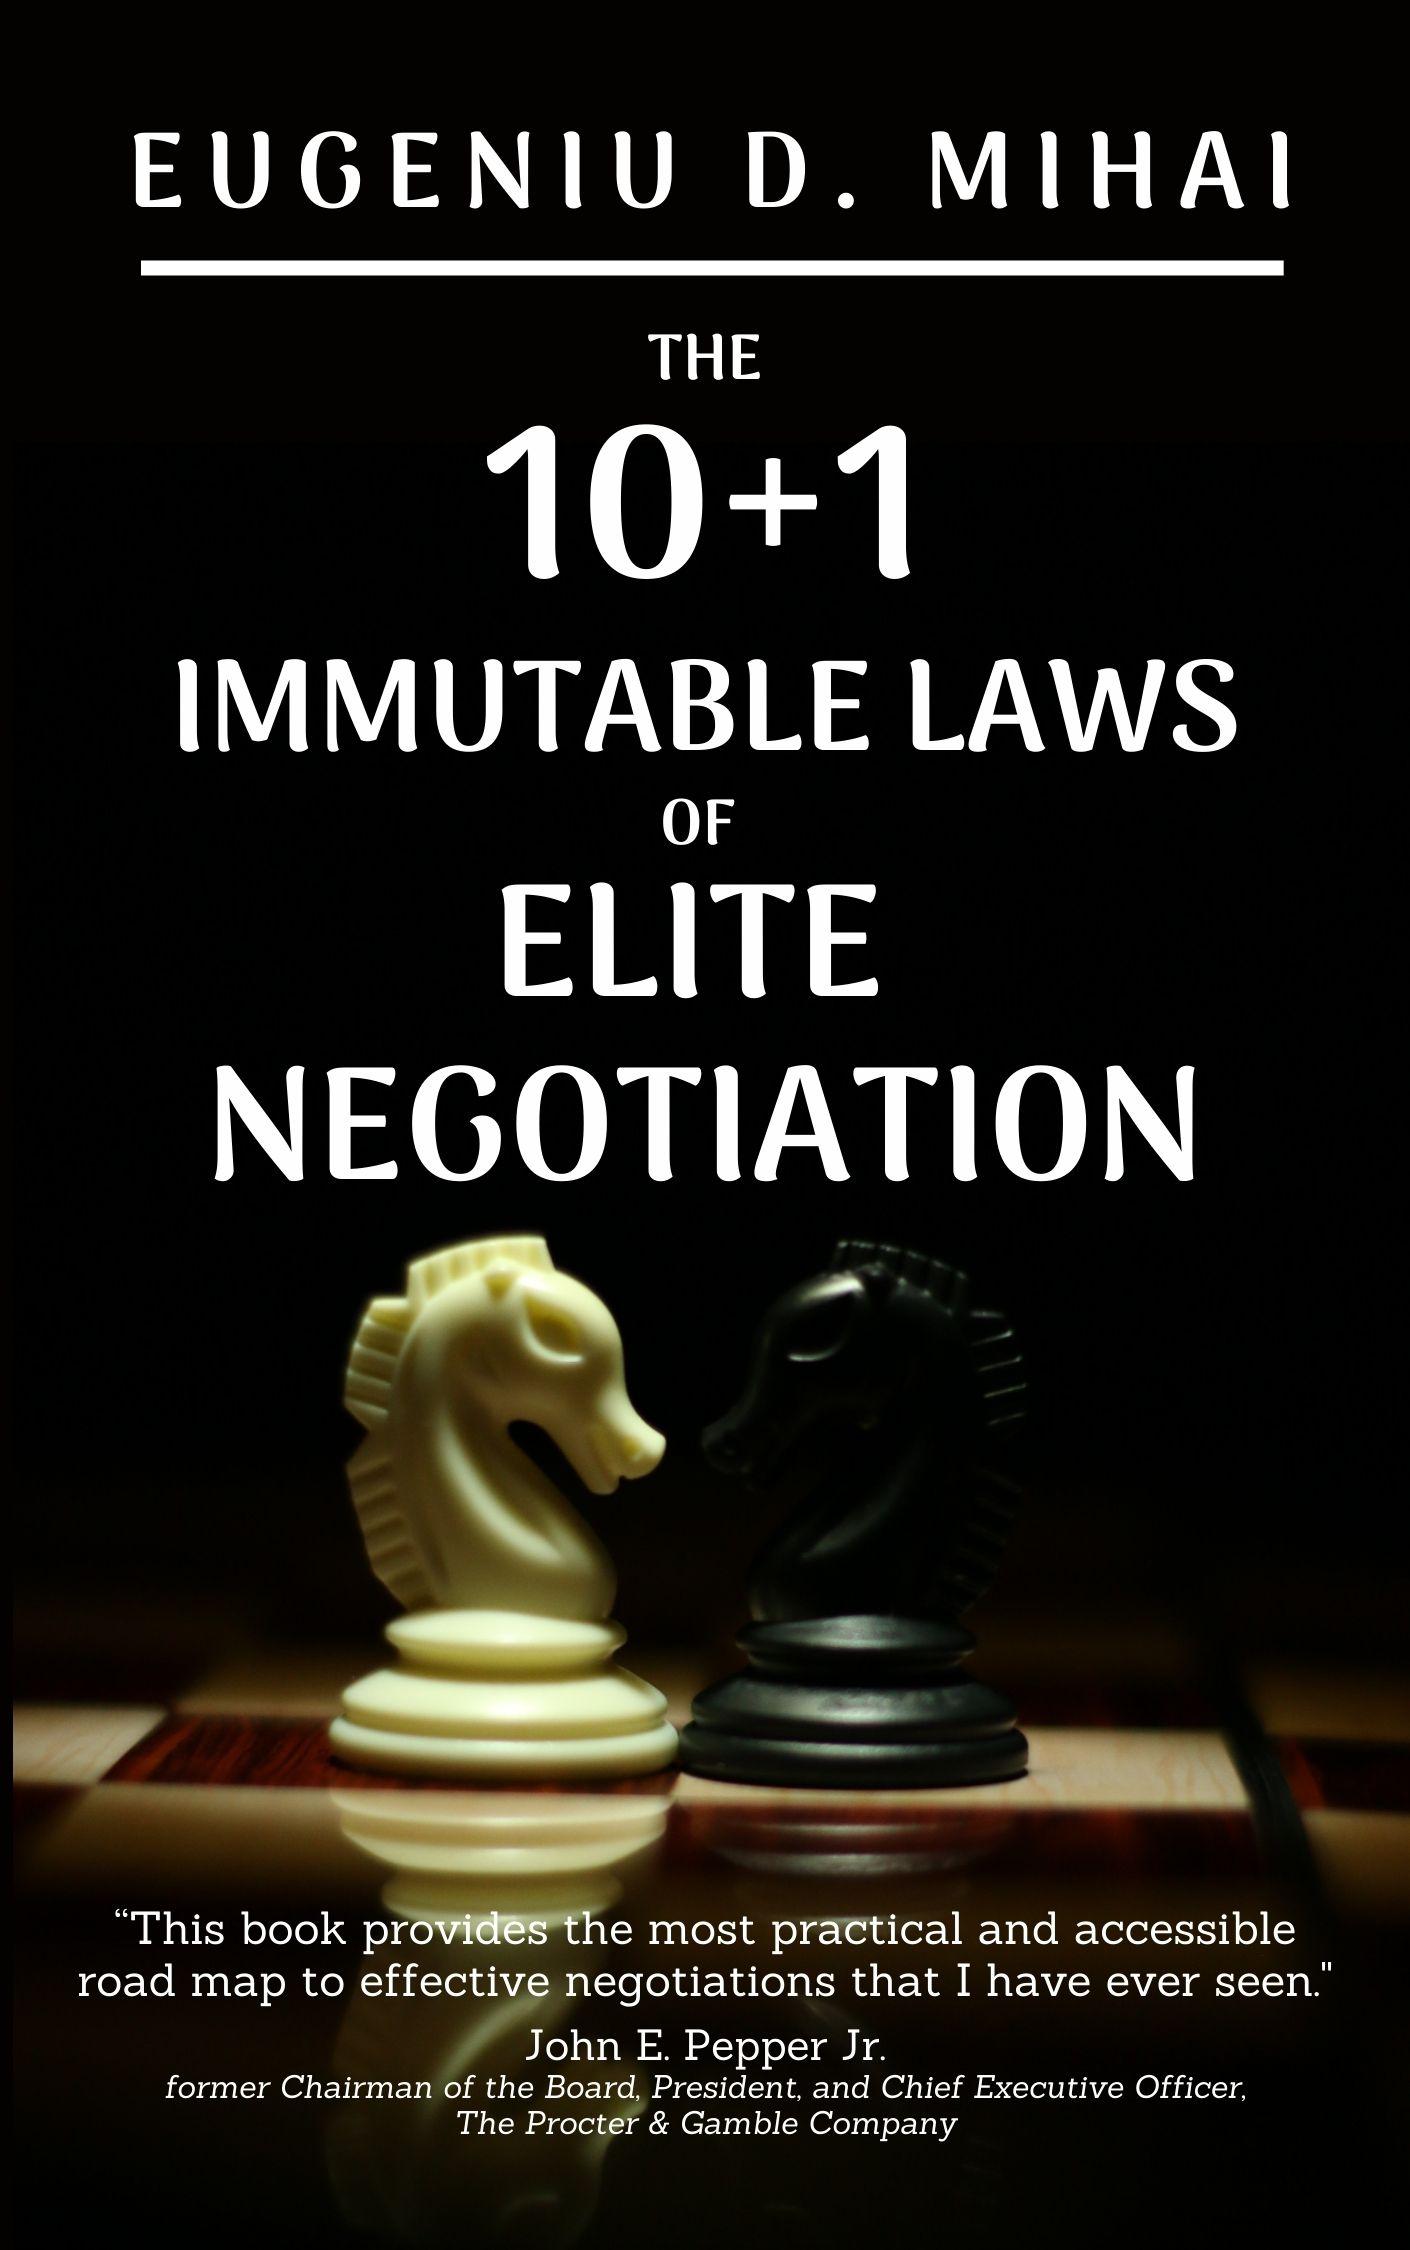 Elite Negotiation